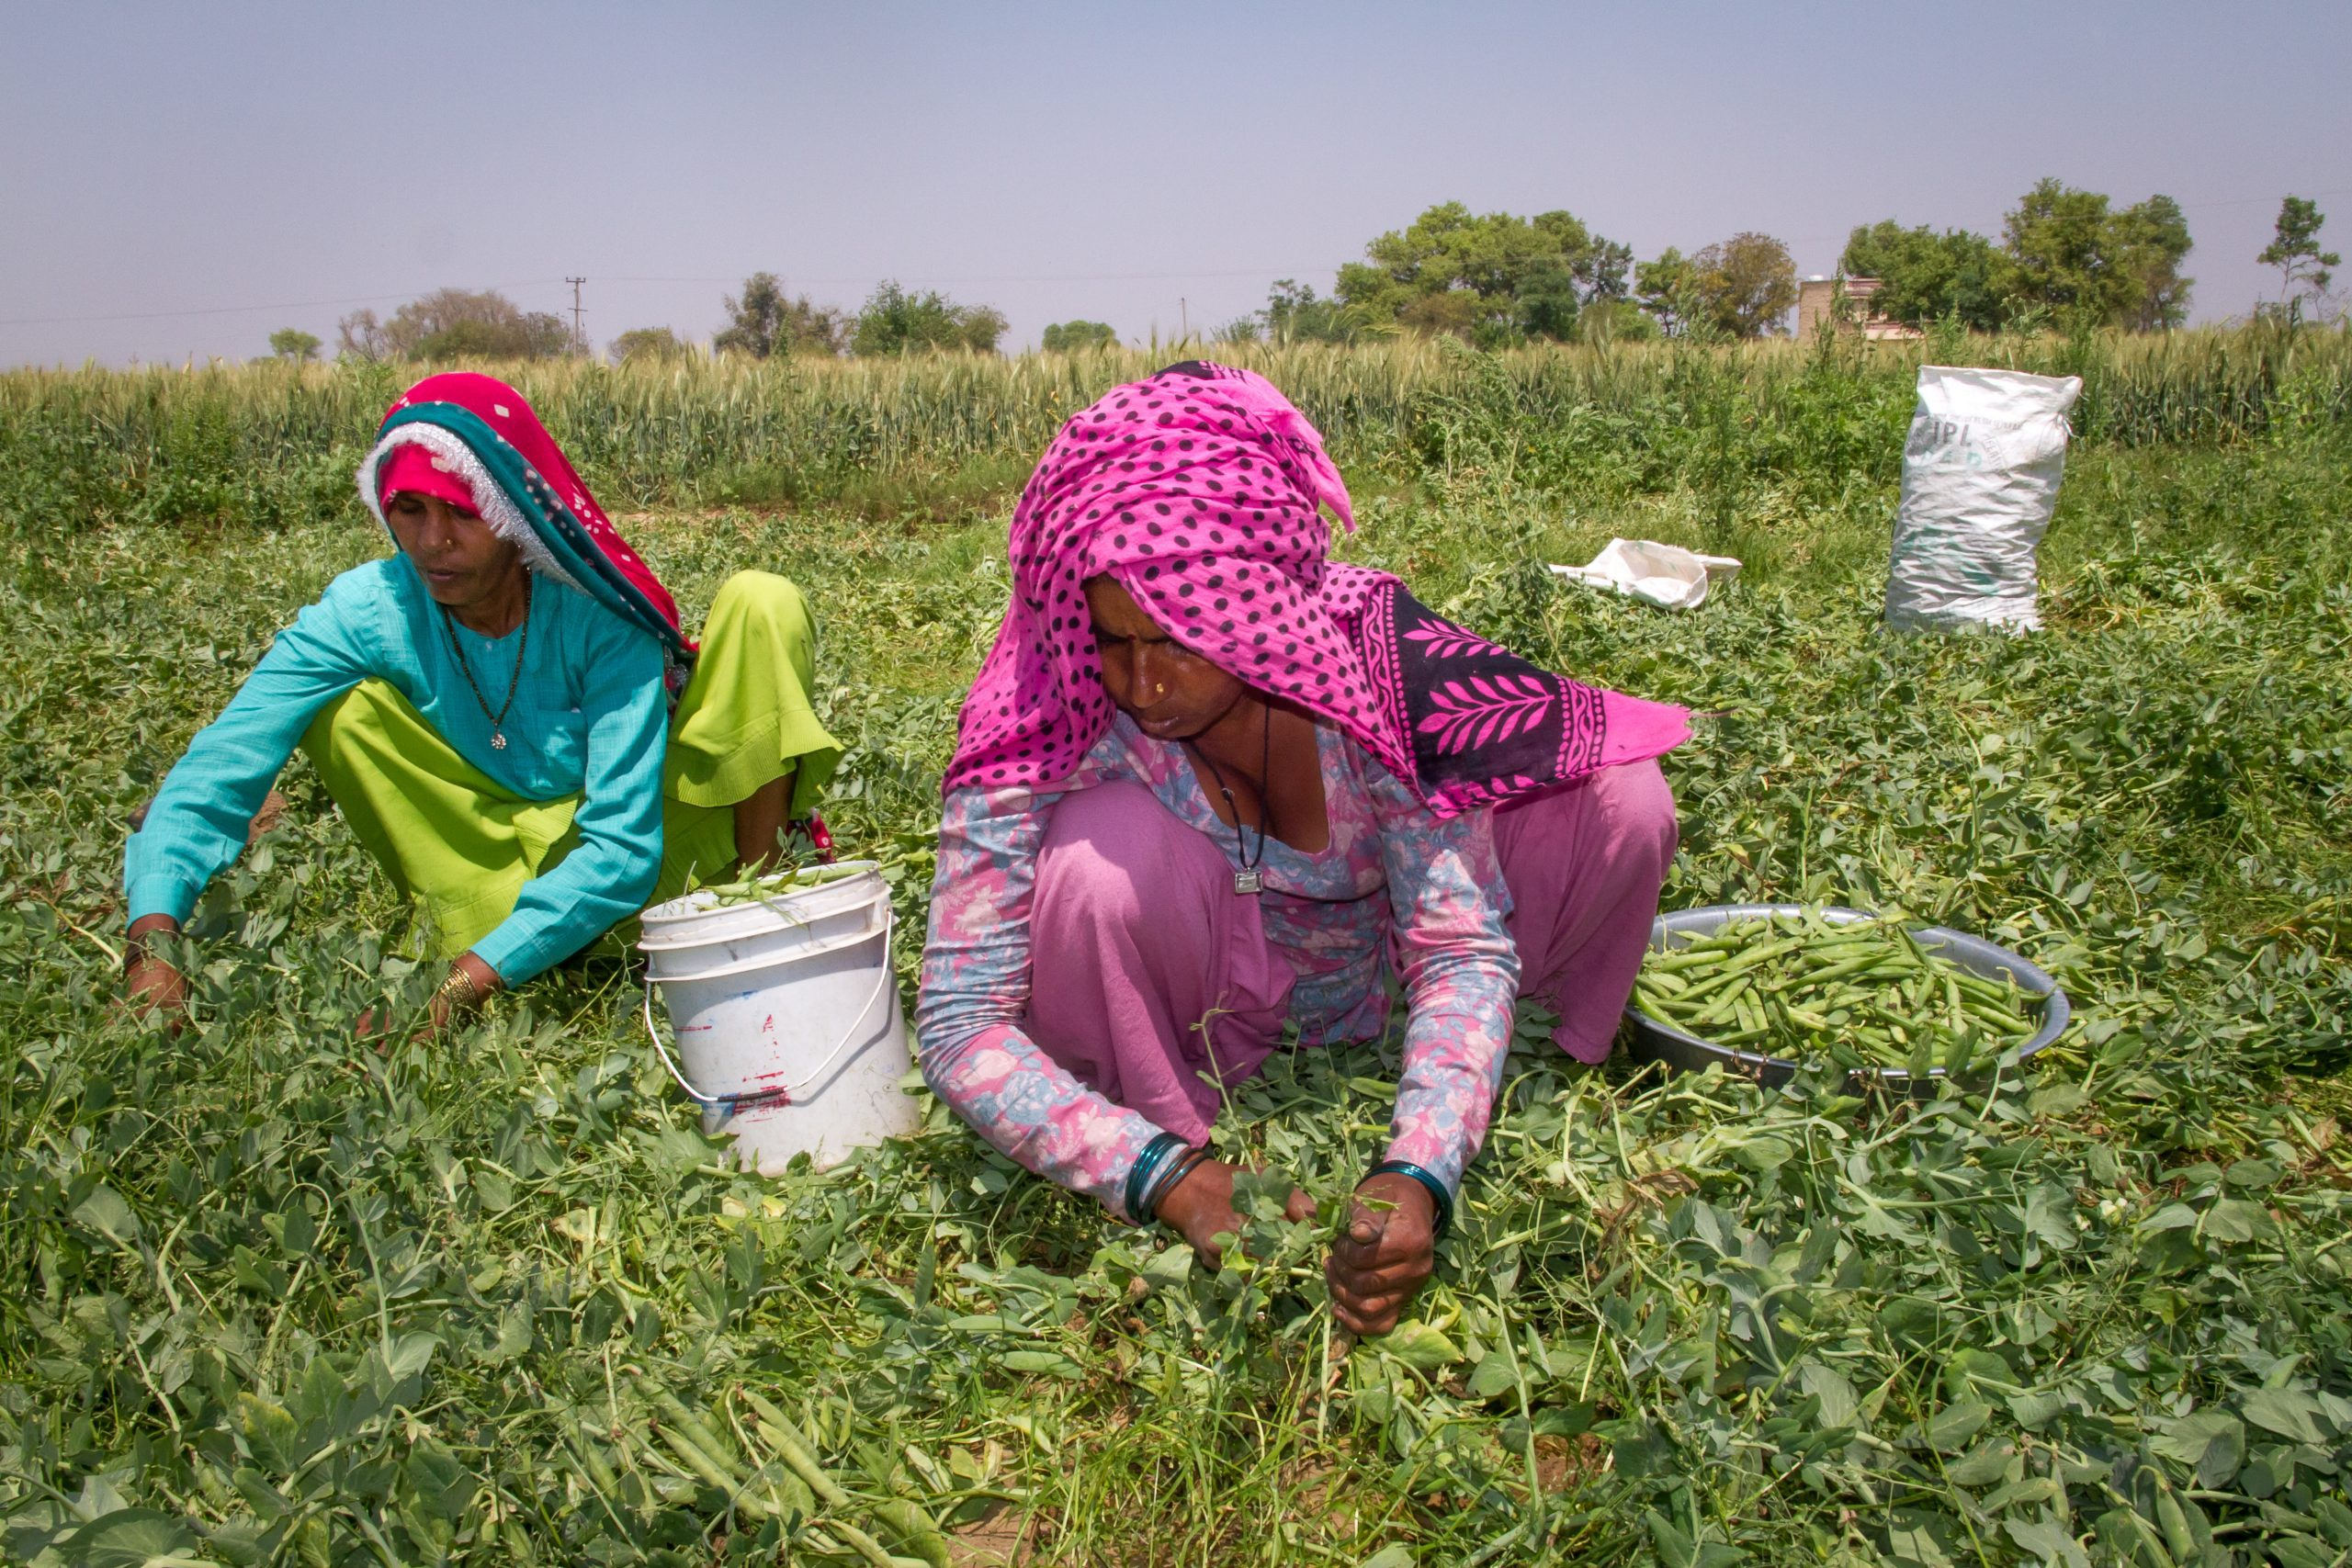 Farmers in India harvest peas